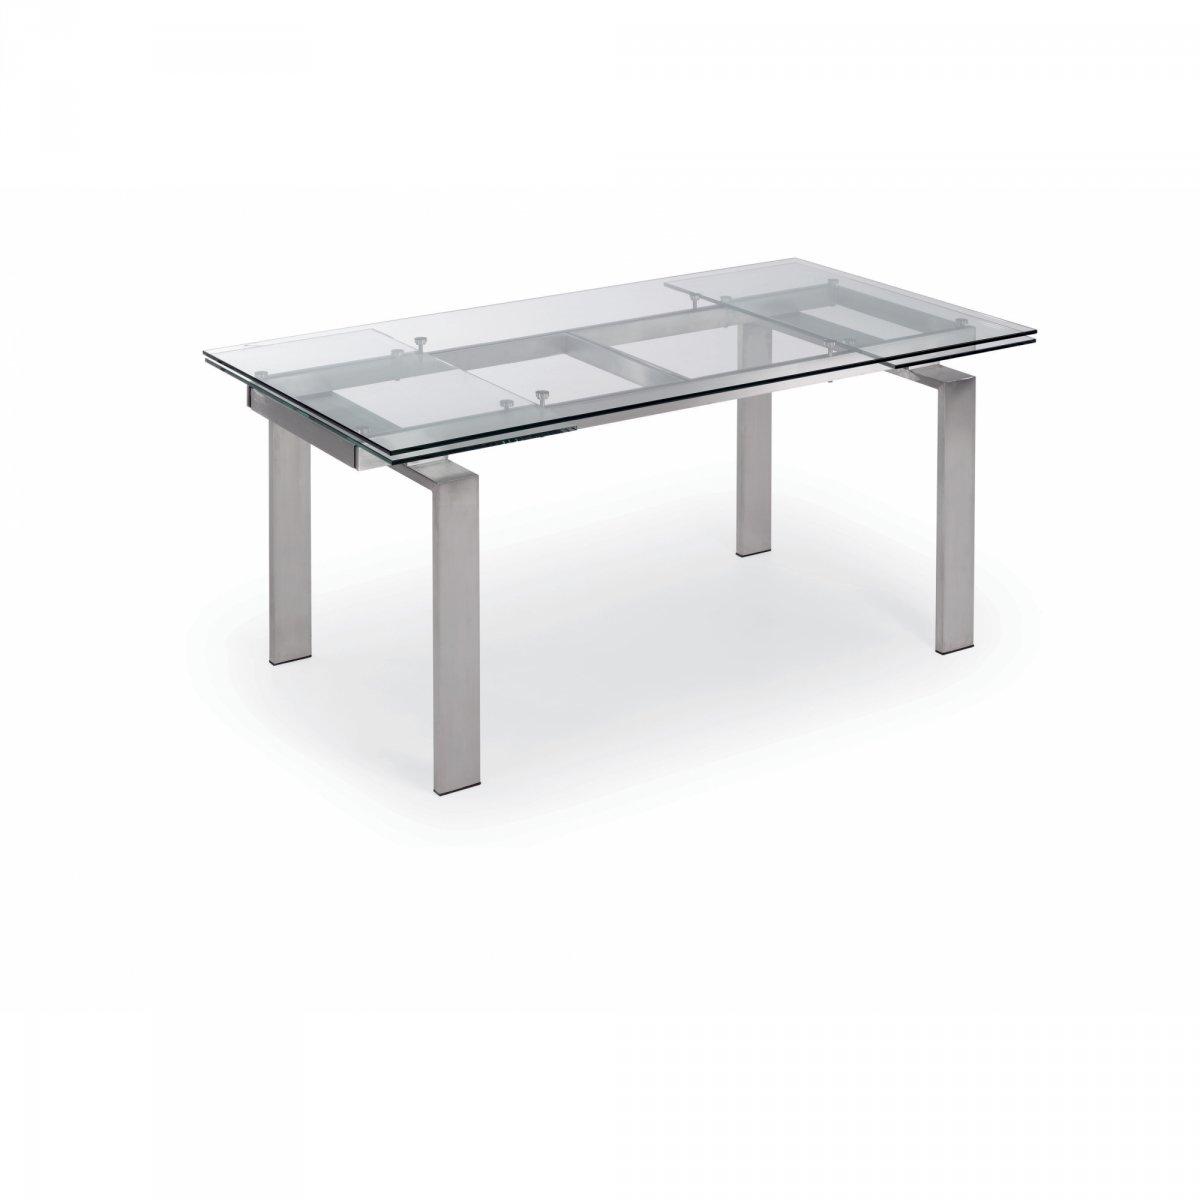 Keihome linea j nara tavolo allungabile piano in vetro trasparente gambe inox keihome linea j - Tavolo trasparente allungabile ...